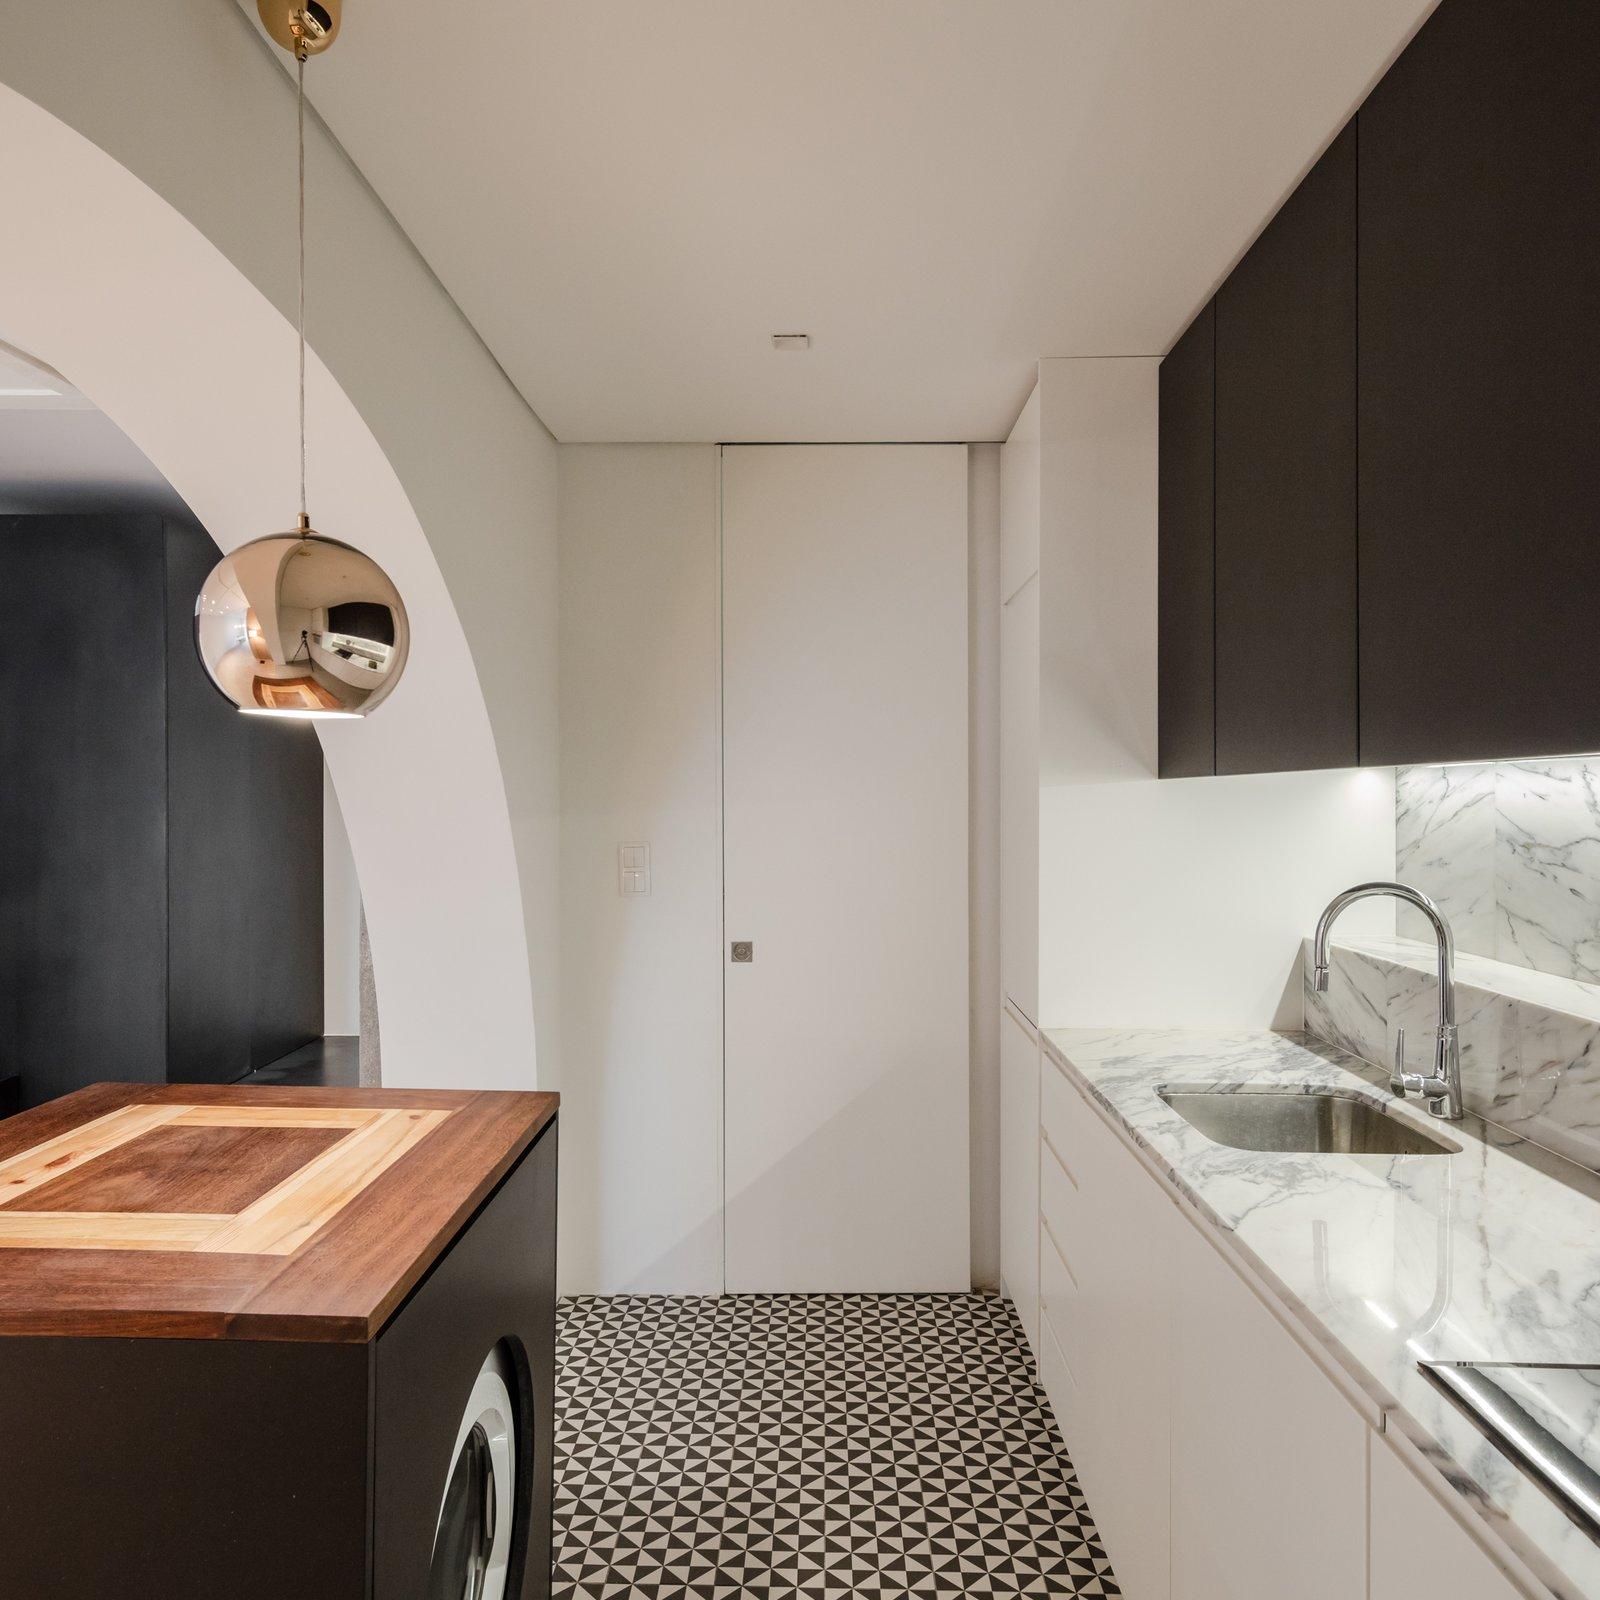 Kitchen, Marble Counter, Wood Cabinet, White Cabinet, Ceramic Tile Floor, Stone Slab Backsplashe, Undermount Sink, and Pendant Lighting  Rua Maria Loft